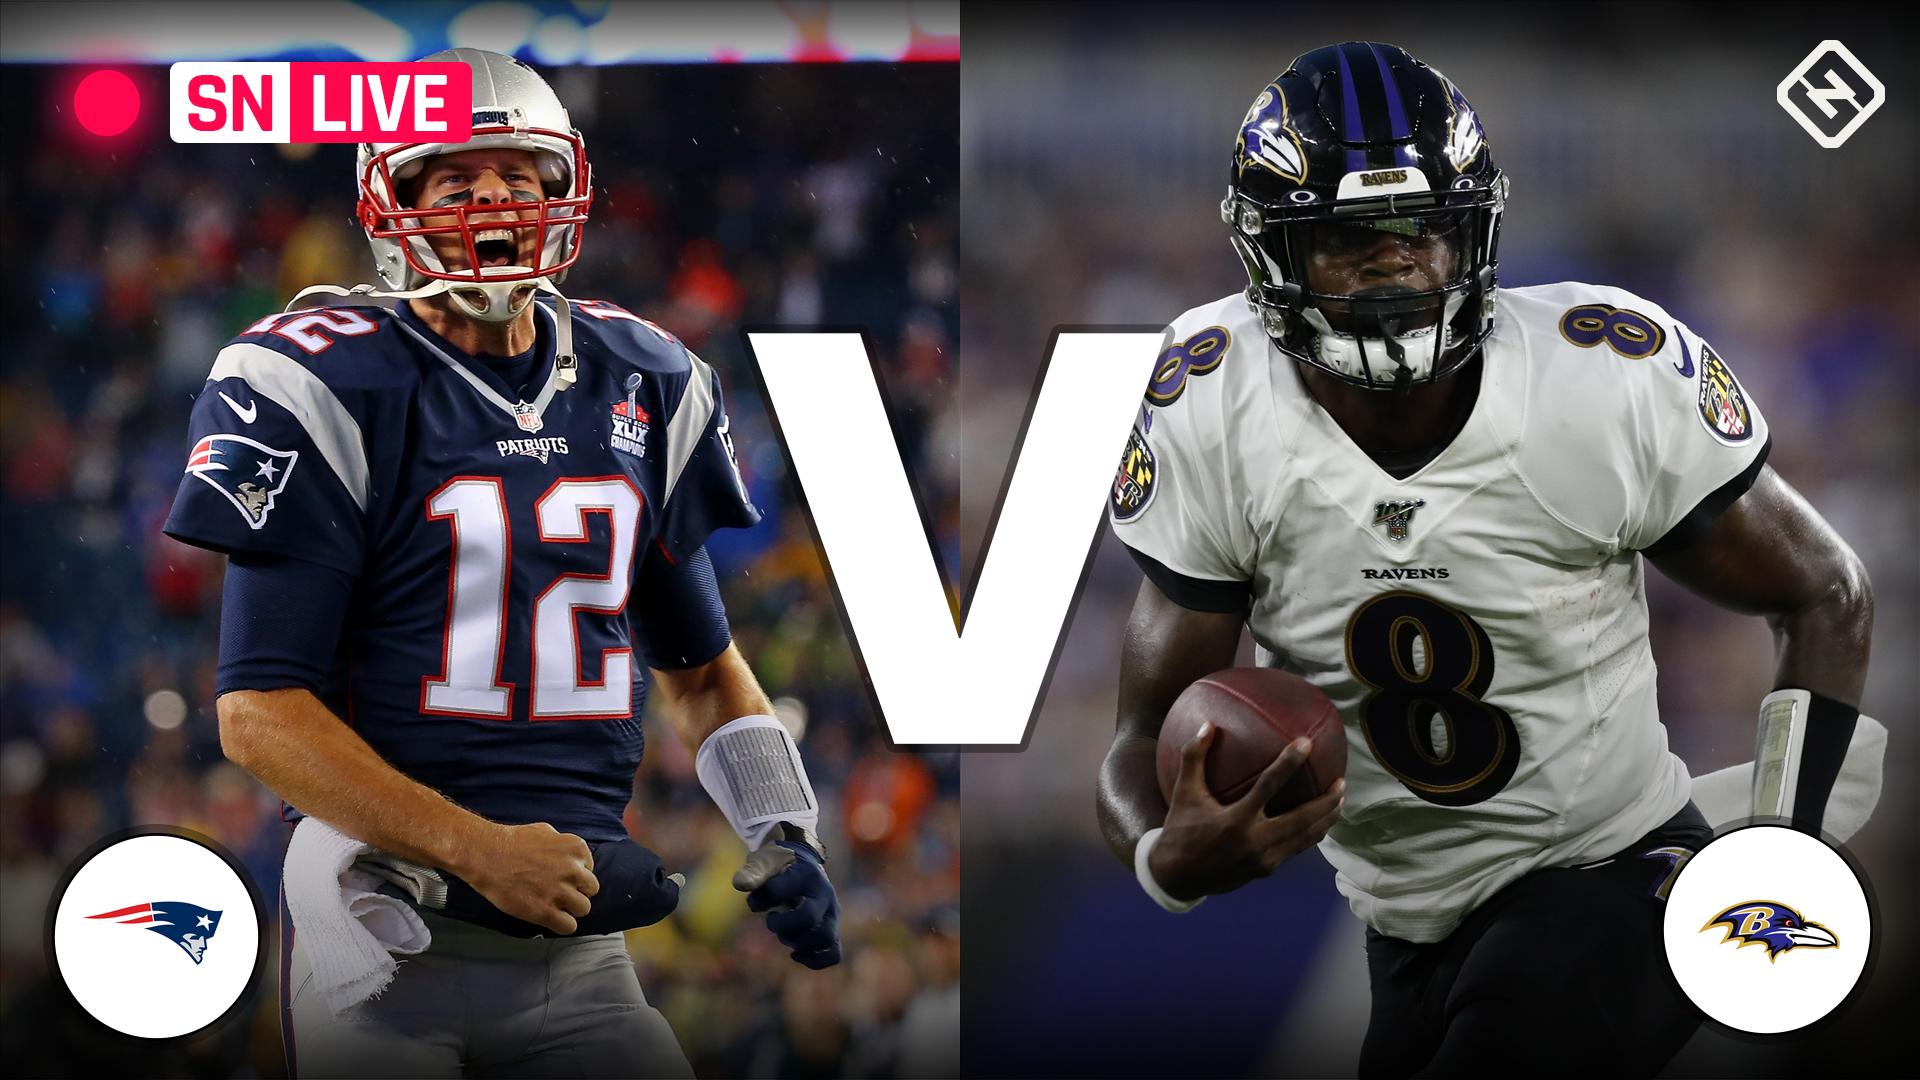 Patriots vs. Ravens: Live score, updates, highlights from 'Sunday Night Football' showdown